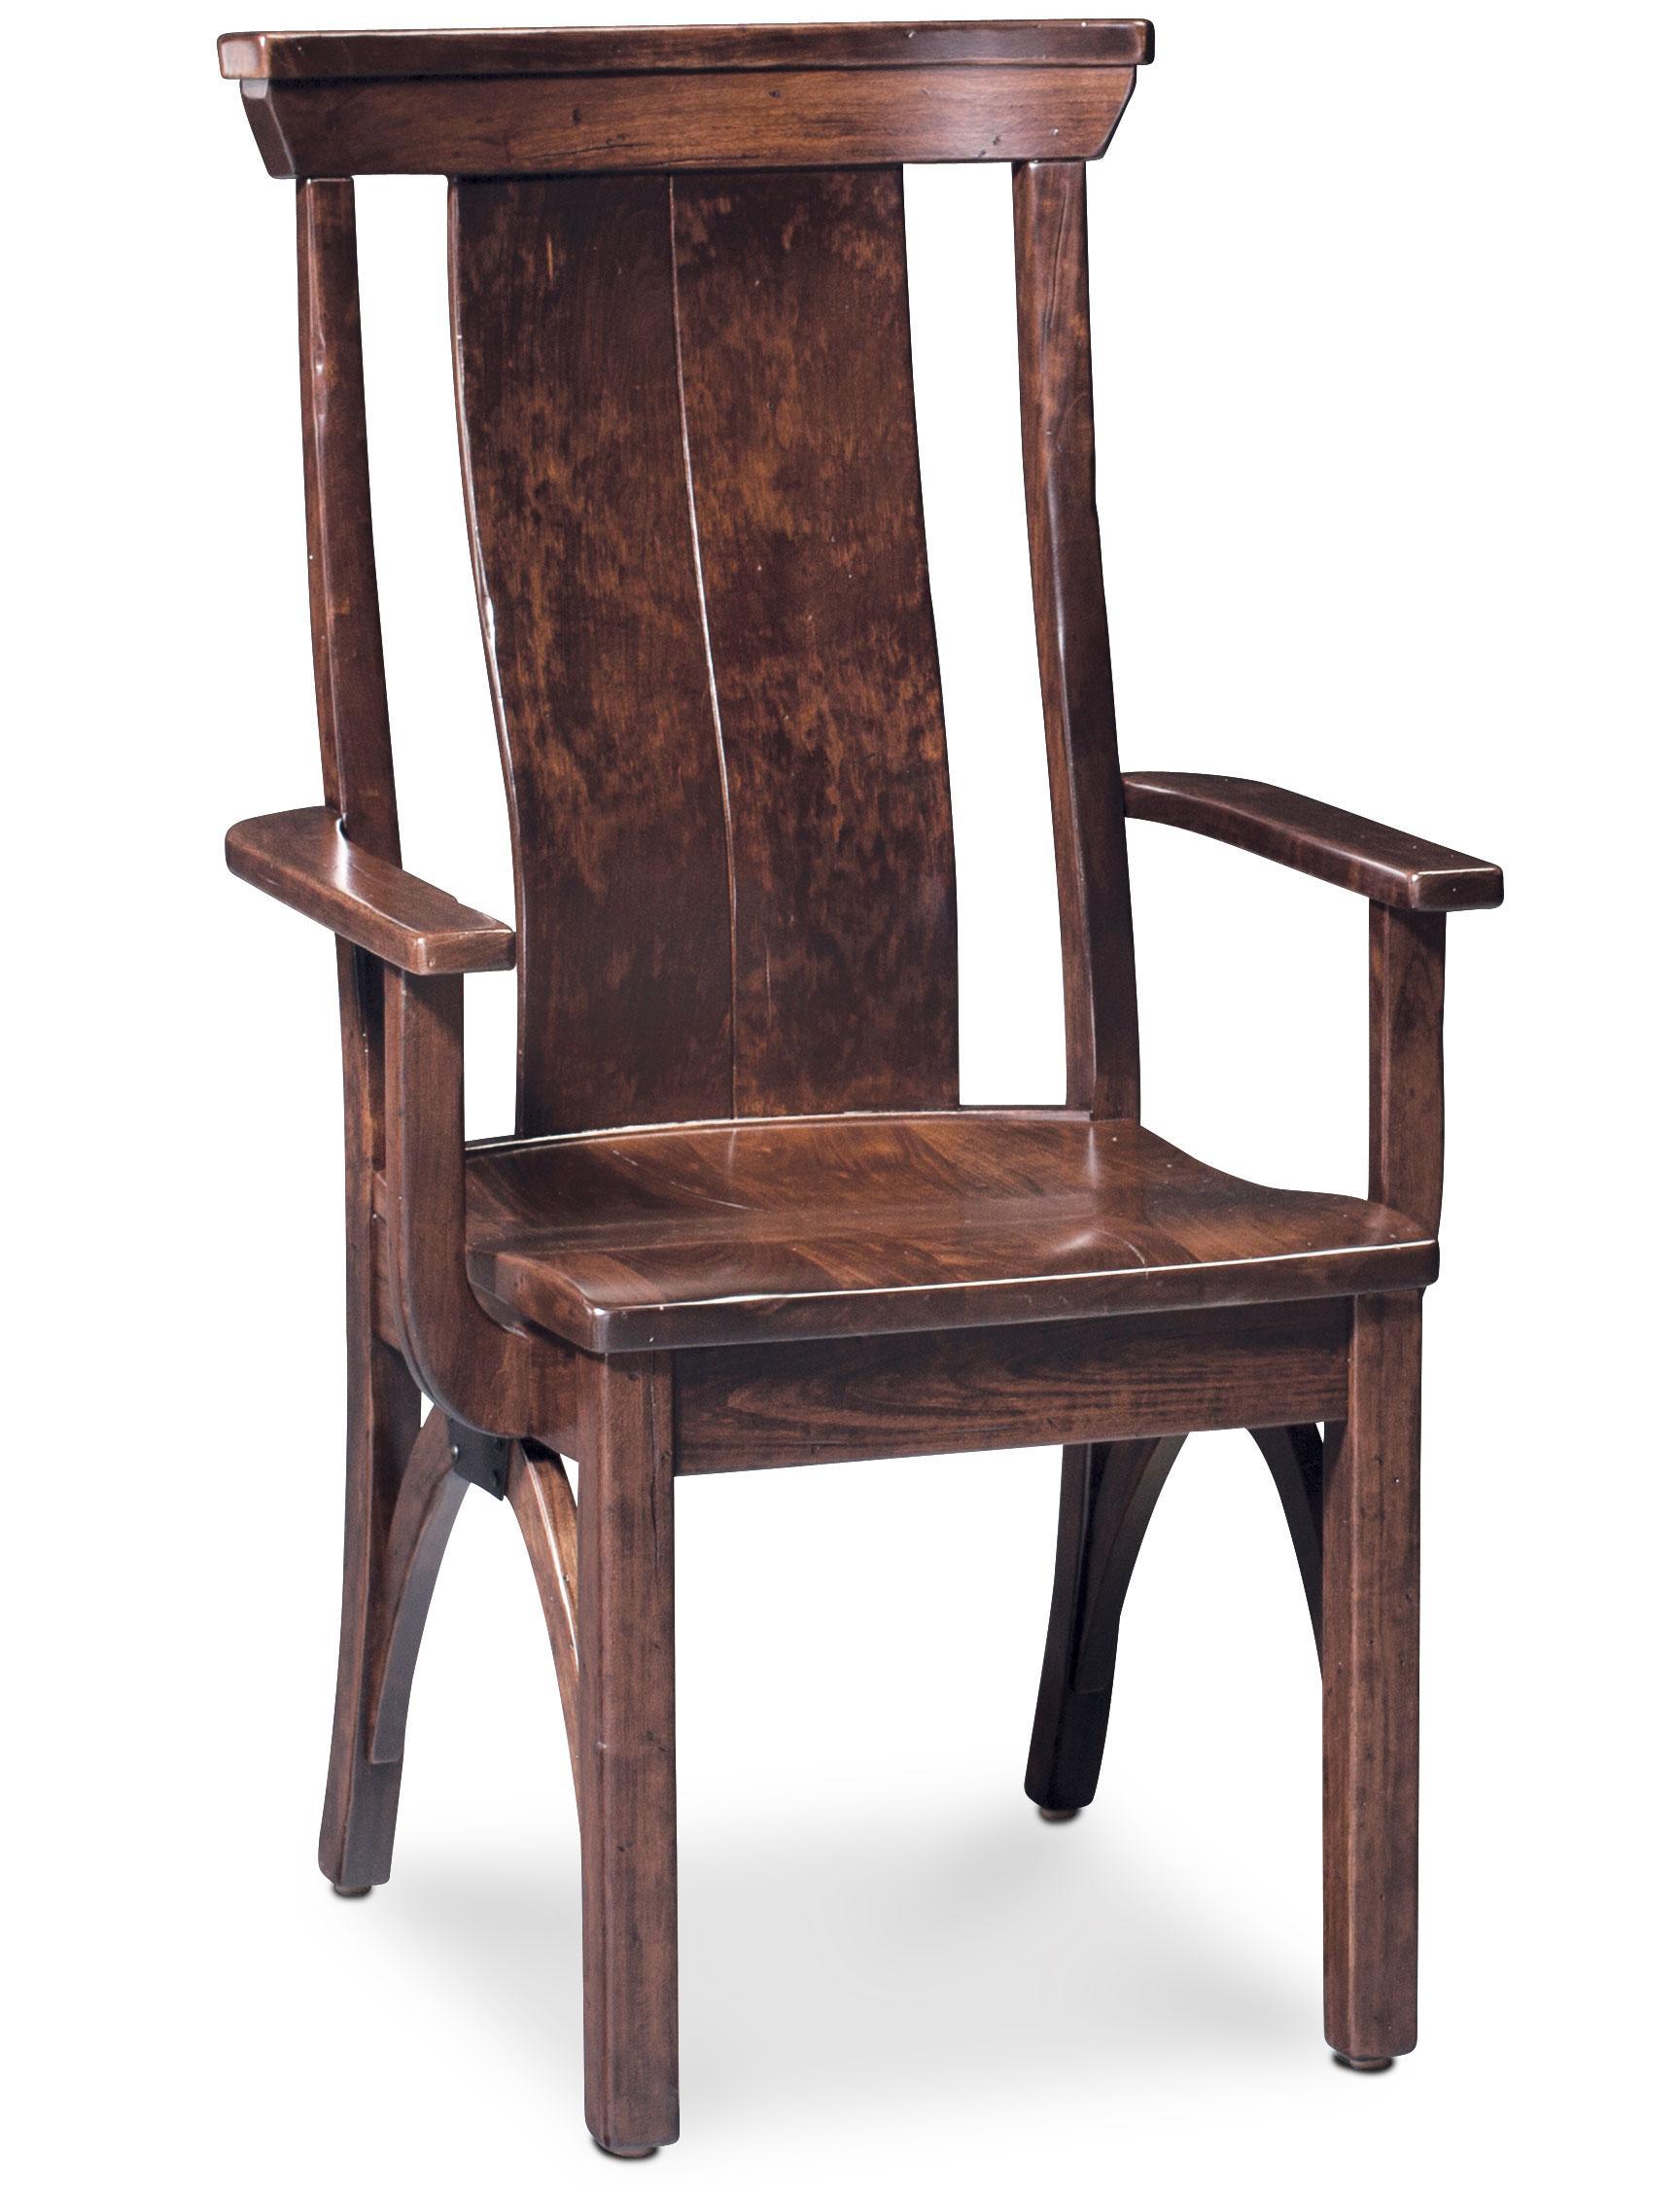 Trestle Bridge Arm Chair with Splat Back